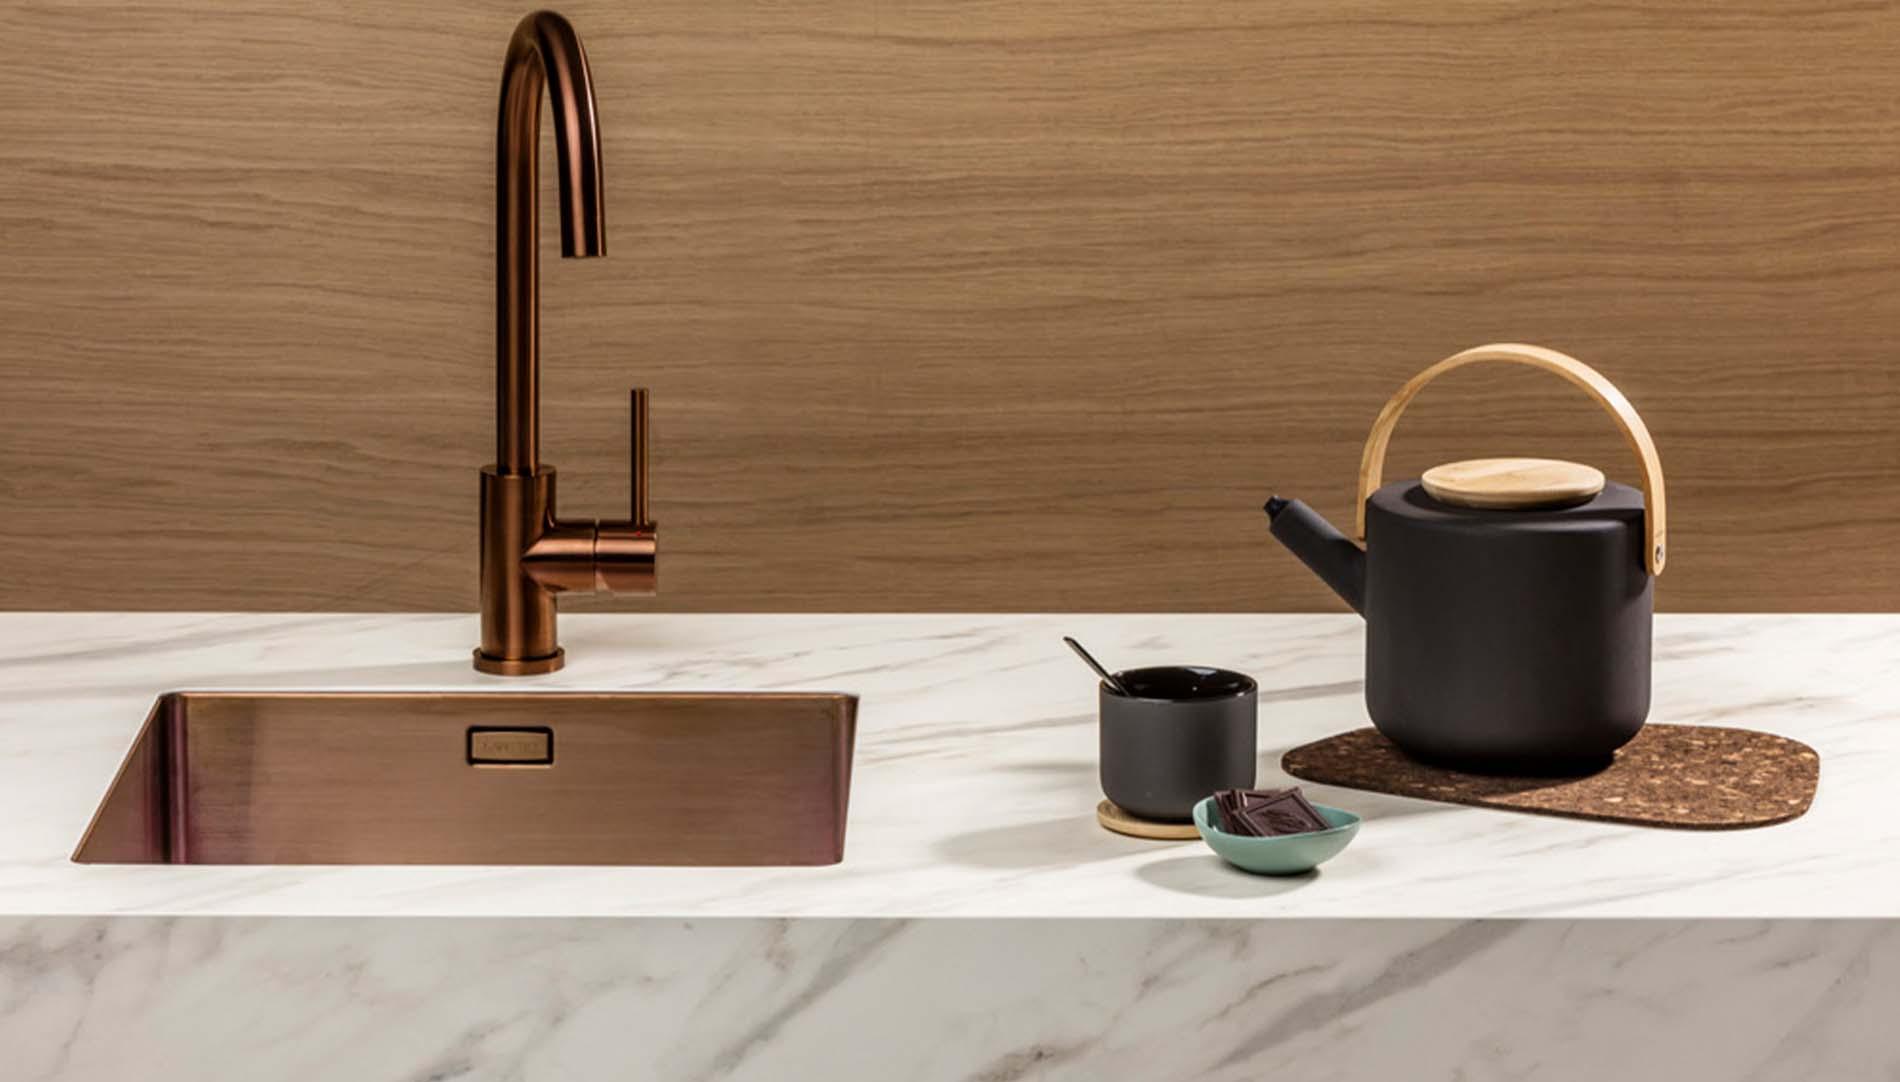 Lanesto keukenkraan Copper met bijpassende spoelbak, Keukenapparatuur ASWA Keukens